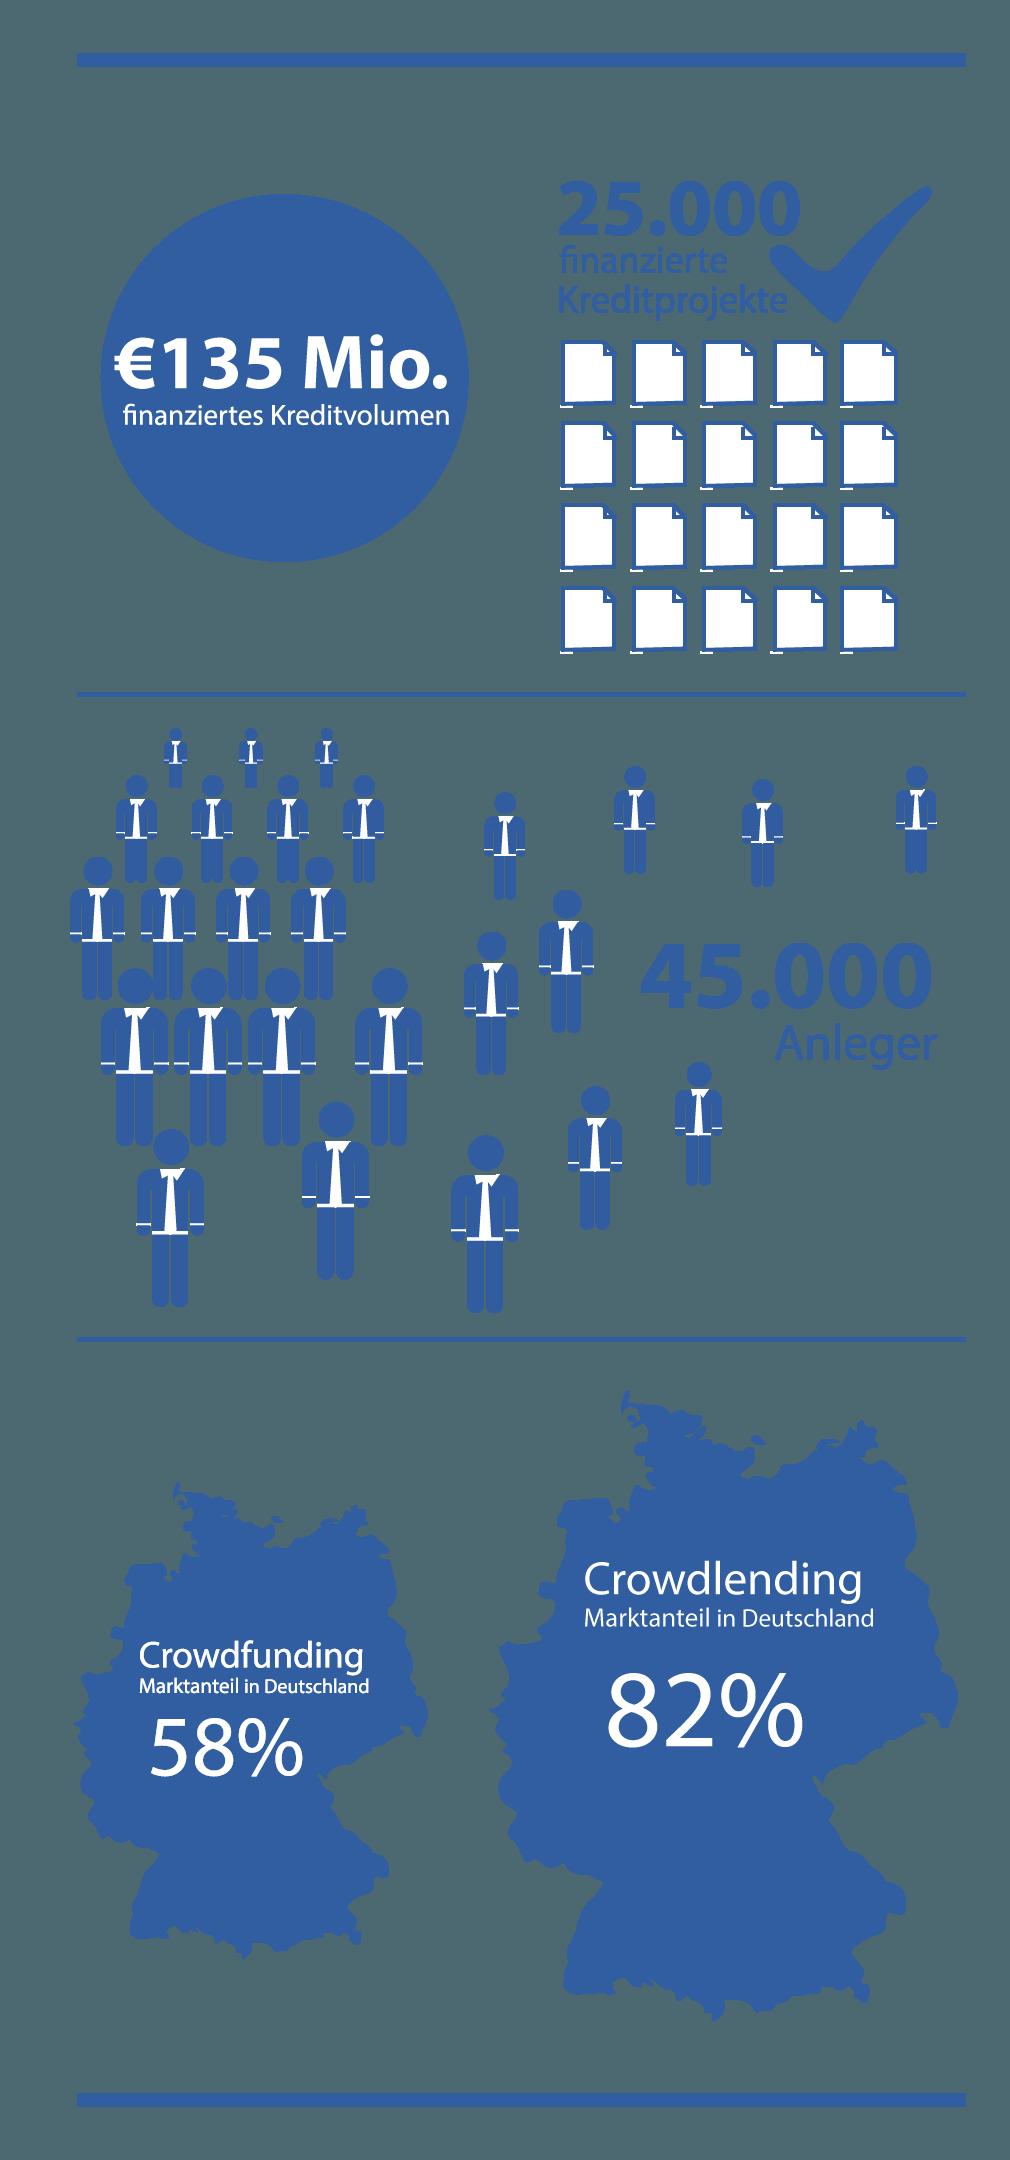 auxmoney marktführer crowdfunding